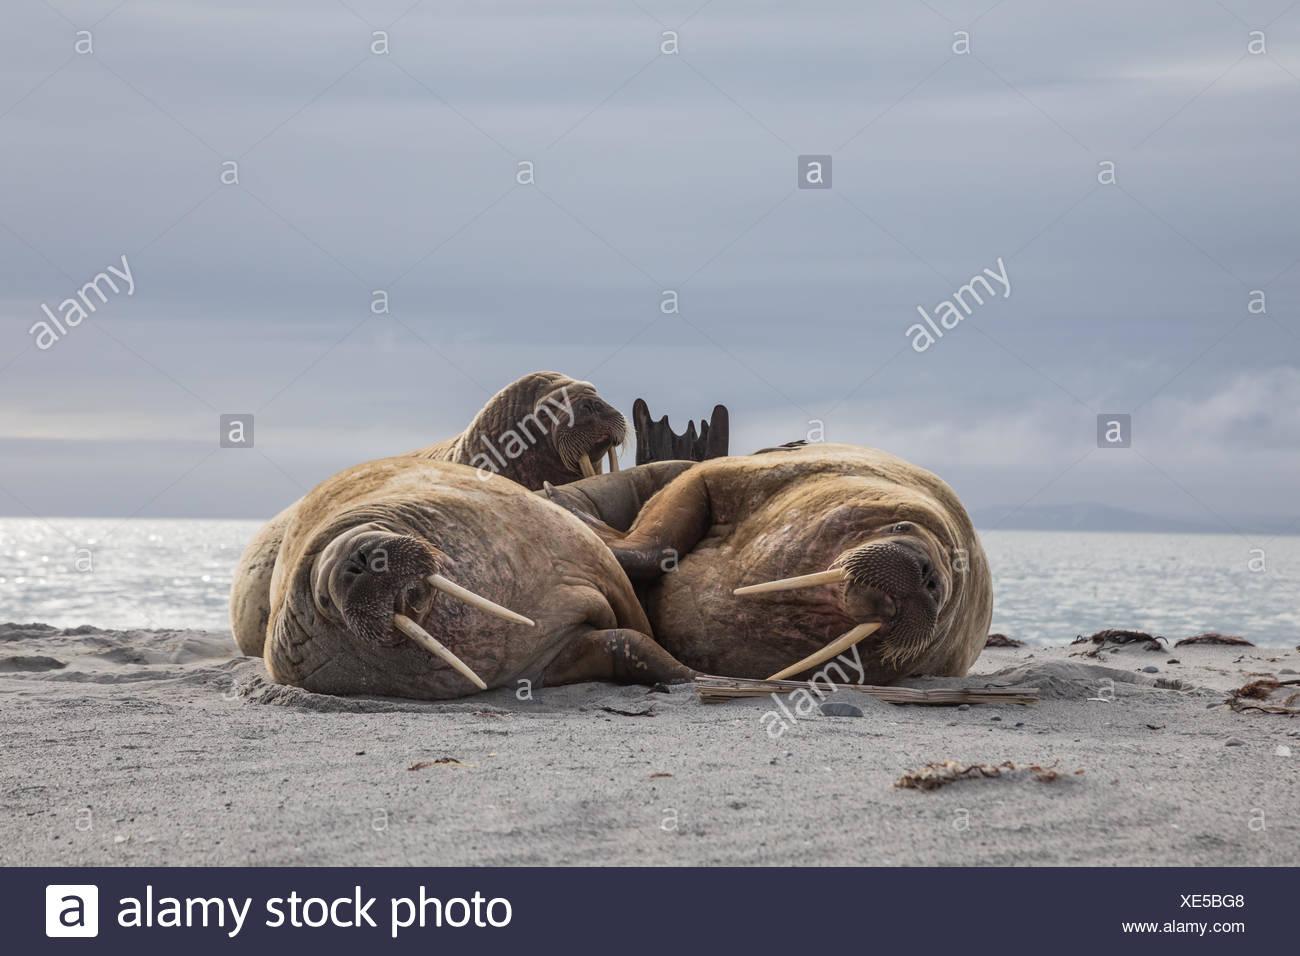 Three bull walruses rest on the beach. Stock Photo